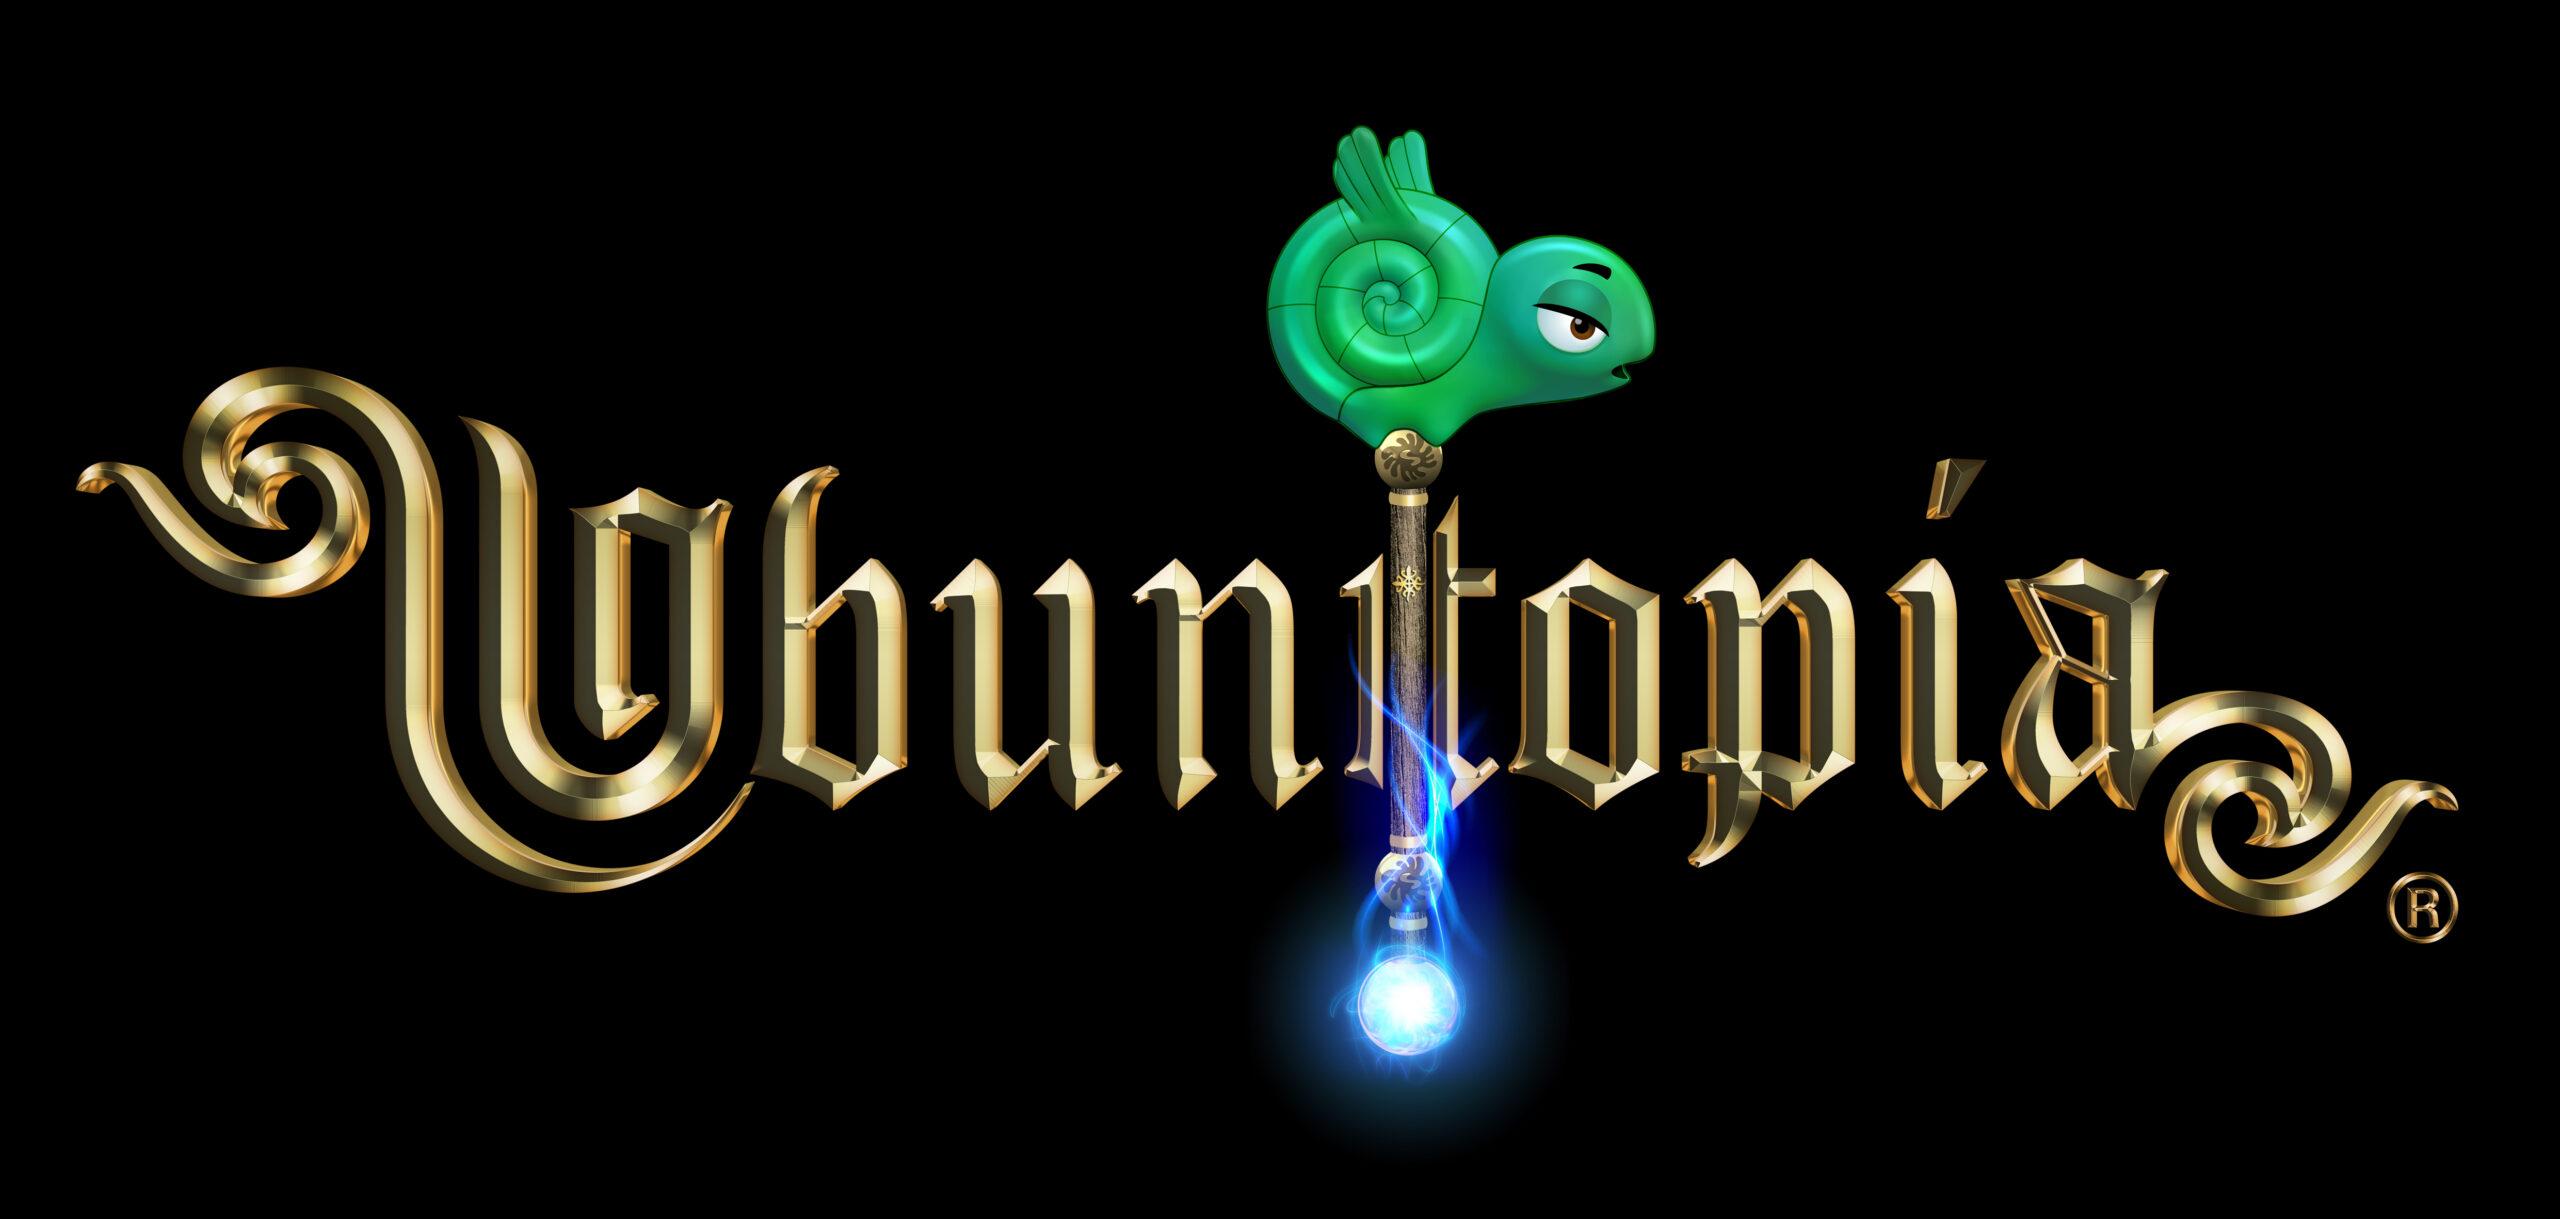 Lyungo als logo